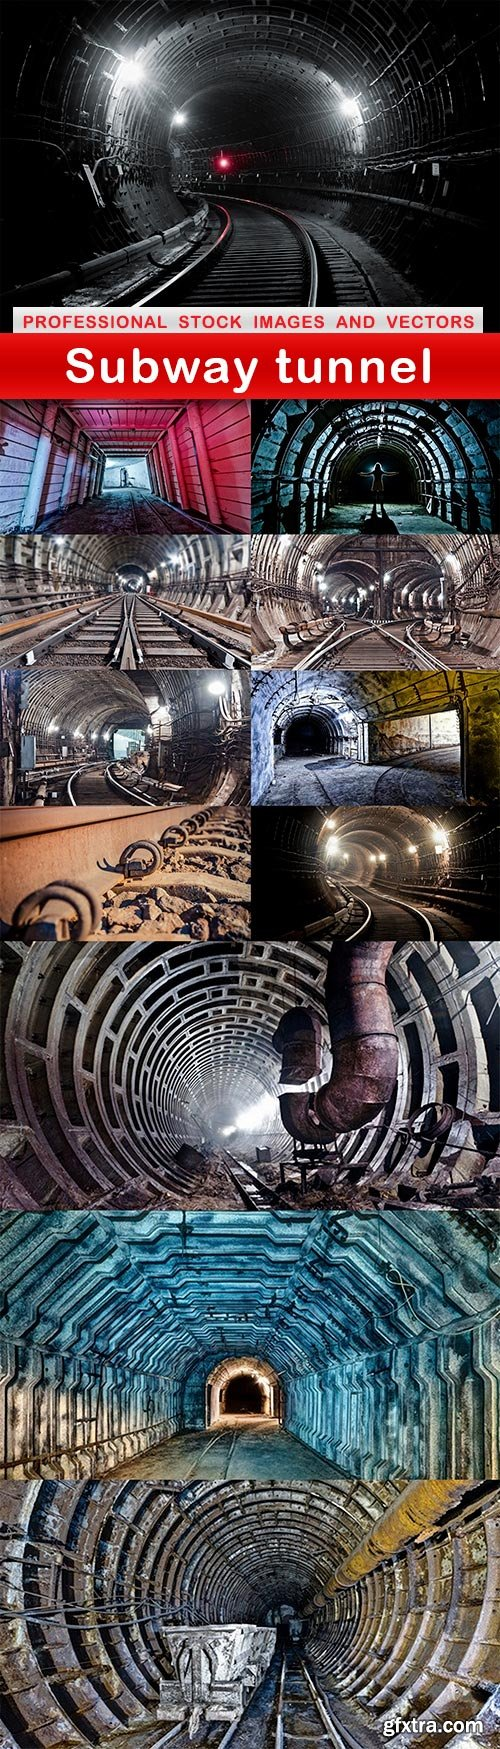 Subway tunnel - 12 UHQ JPEG